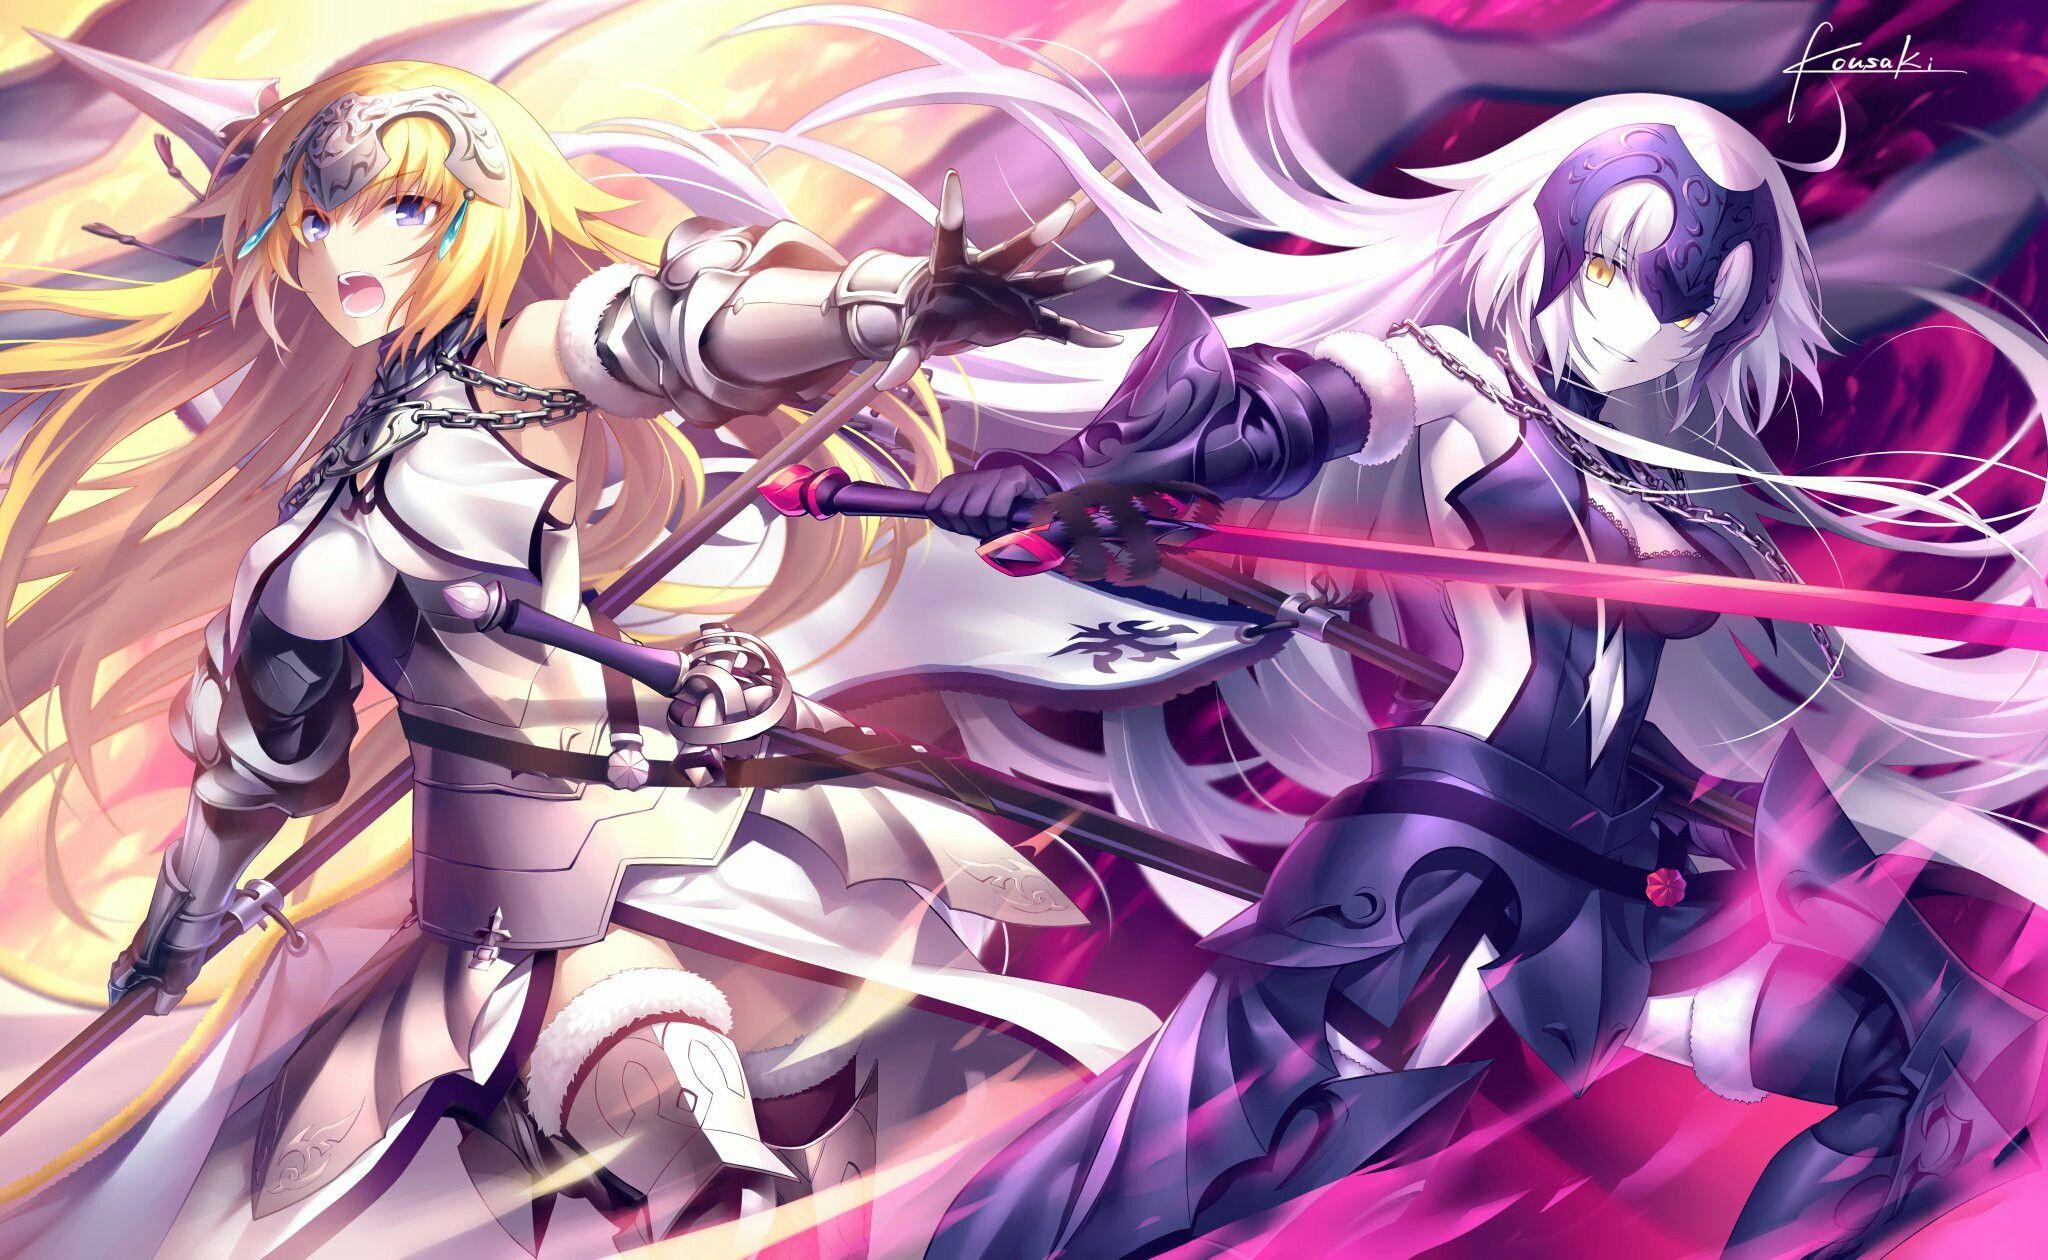 Fate Grand Order Fate Apocrypha Jeanne D Arc Ruler Jeanne Alter Avenger Anime Jeanne D Arc Fate Joan Of Arc Fate